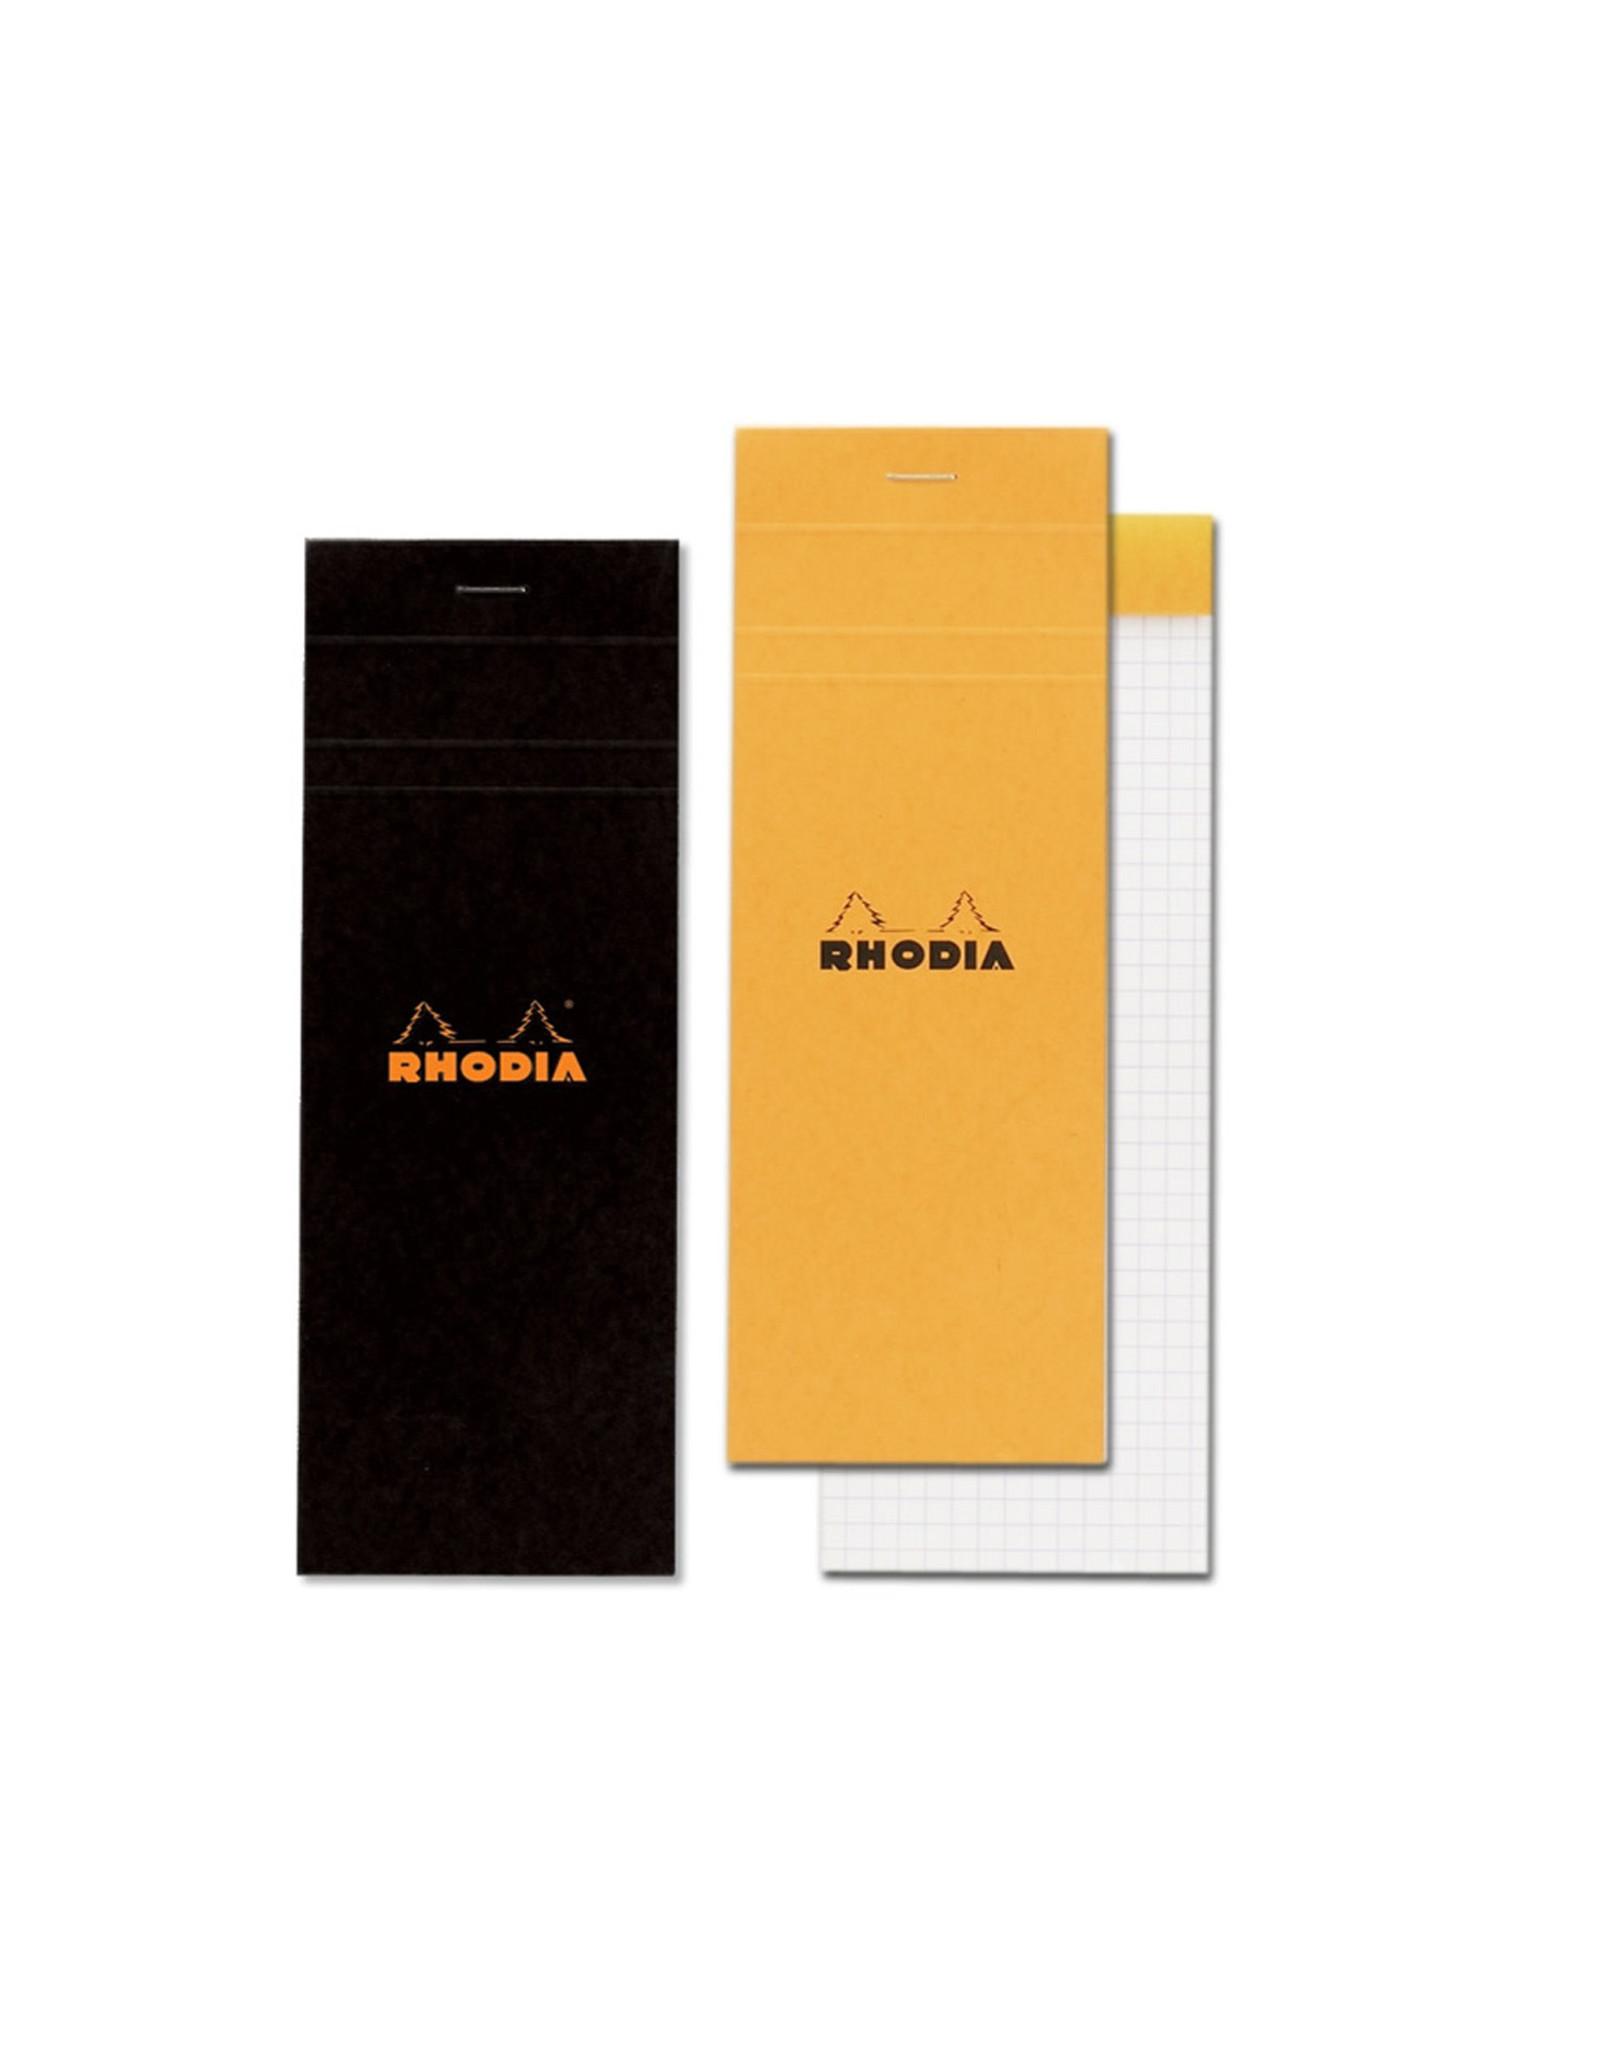 Rhodia Pad No. 8, Graph Black 5x5